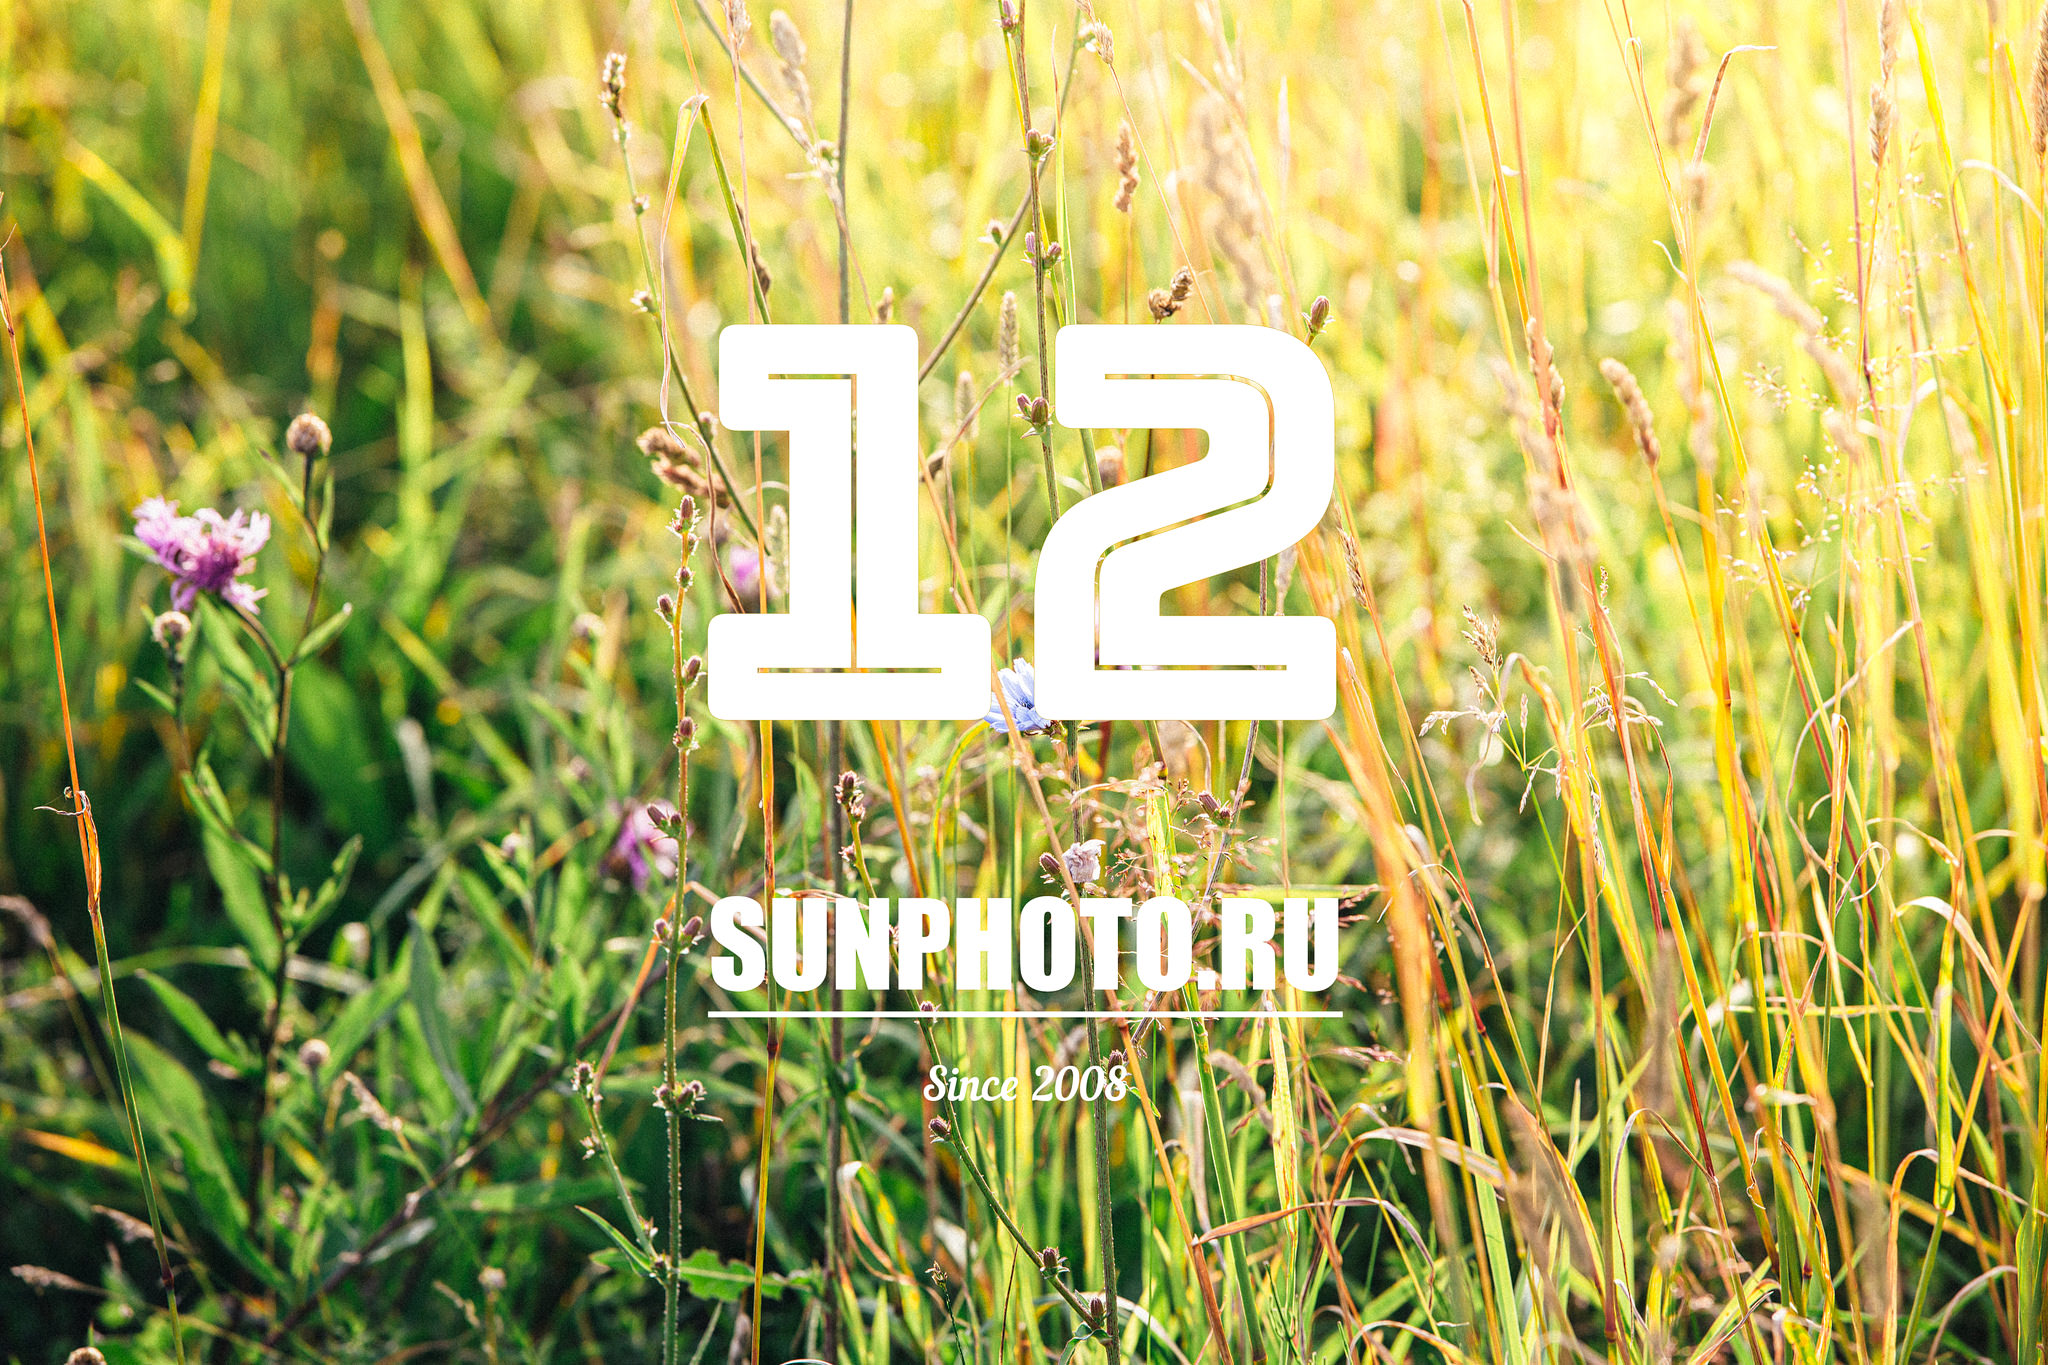 SUNPHOTO.RU - 12 лет